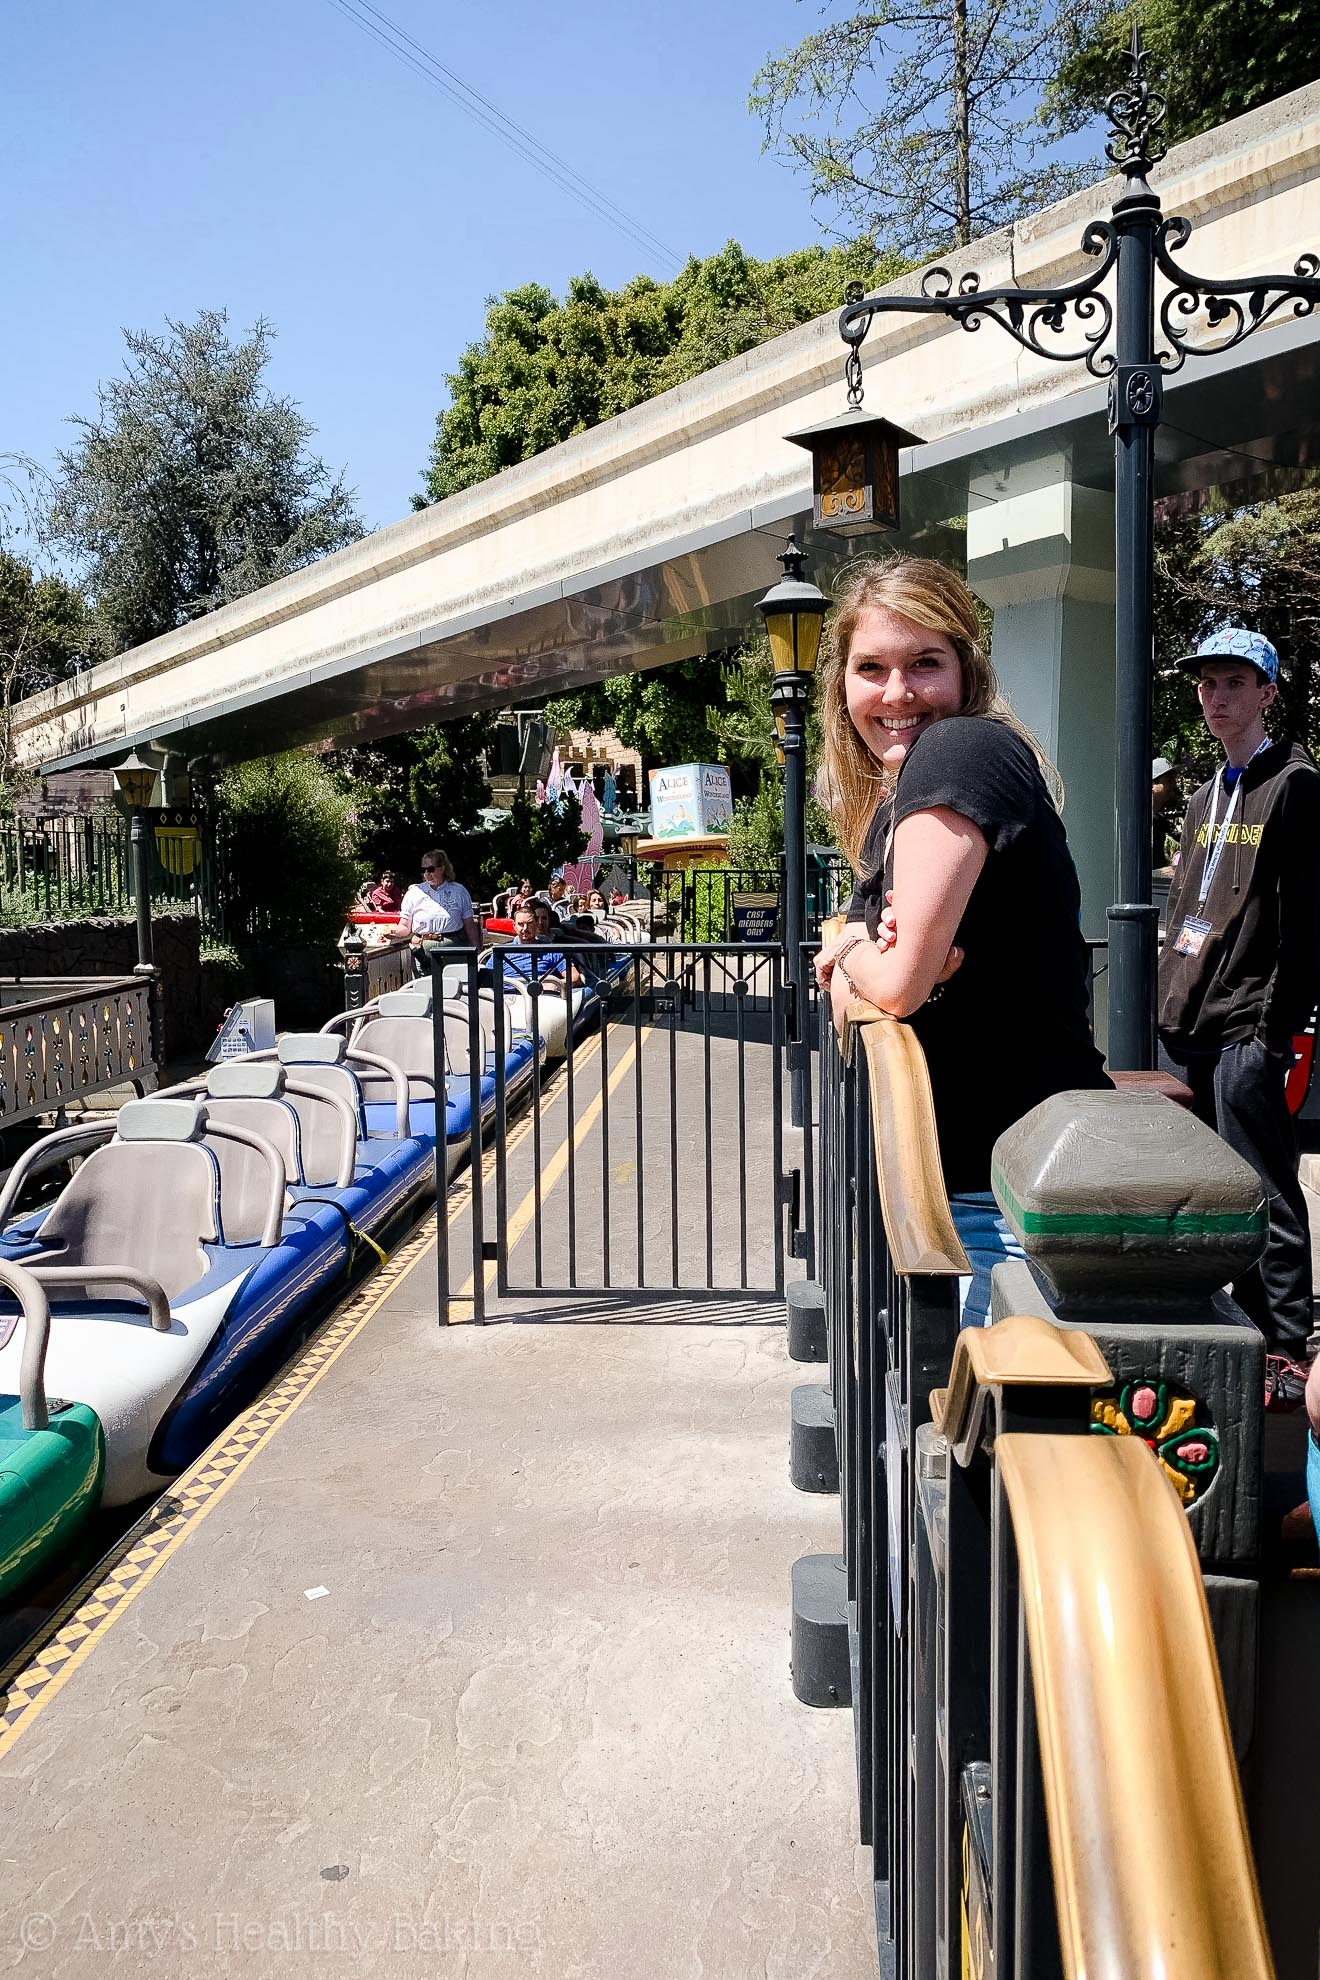 The Matterhorn ride in Disneyland - Anaheim, California